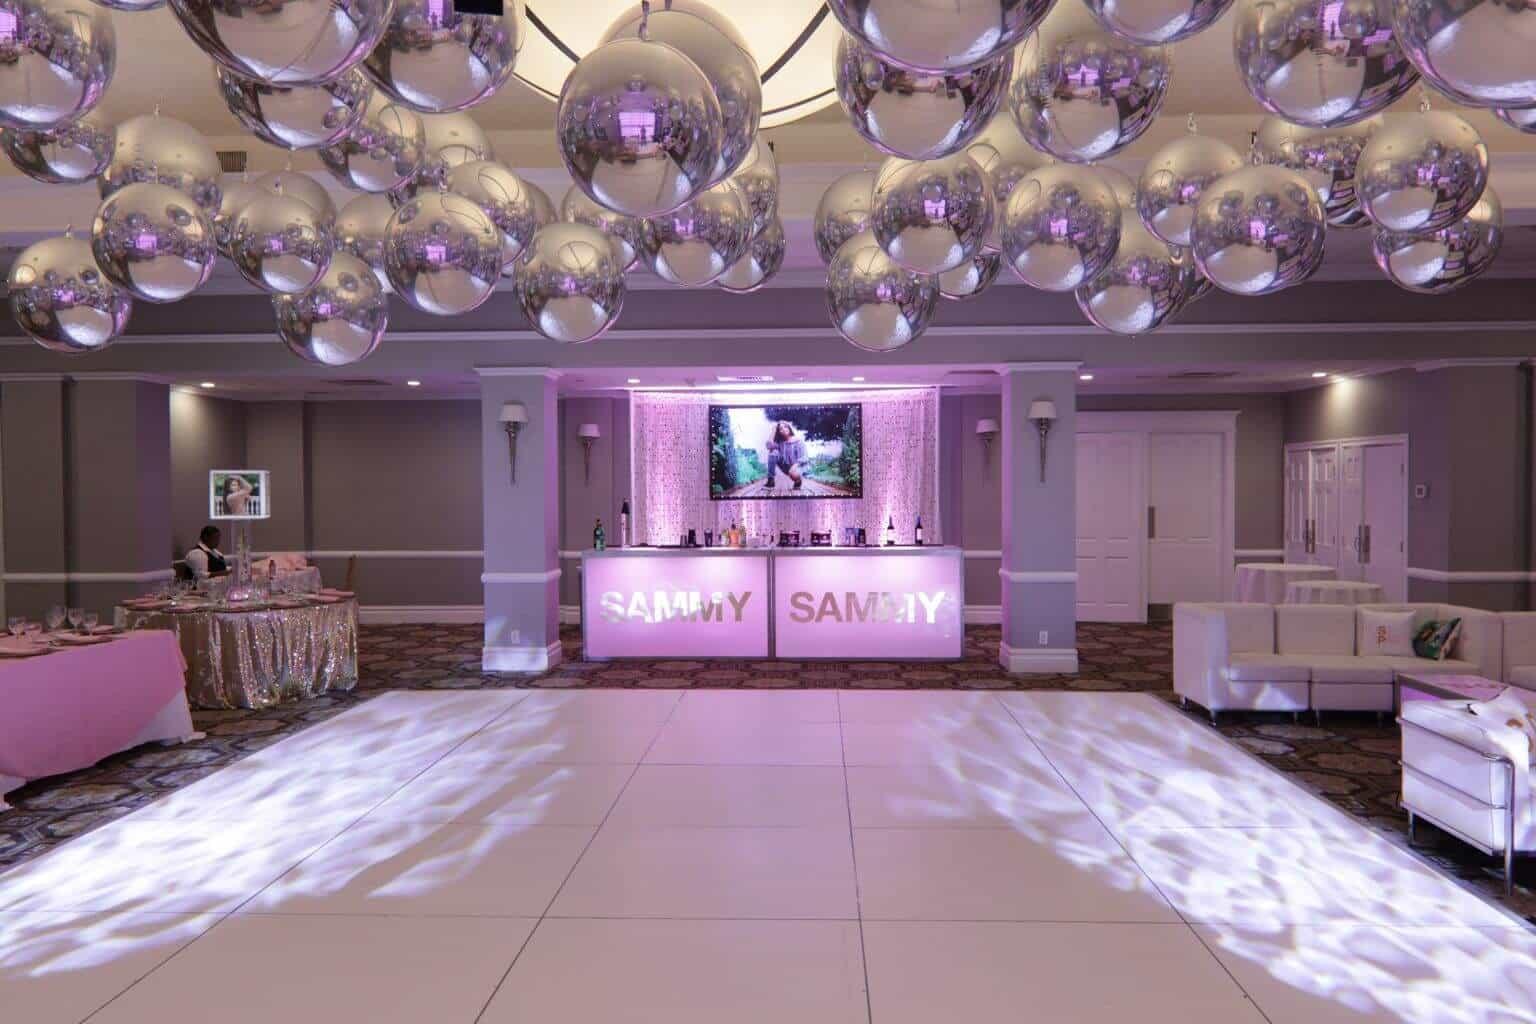 Bat Mitzvah Setup With Metallic Orbz Over Dance Floor Led Bar Bling Photo